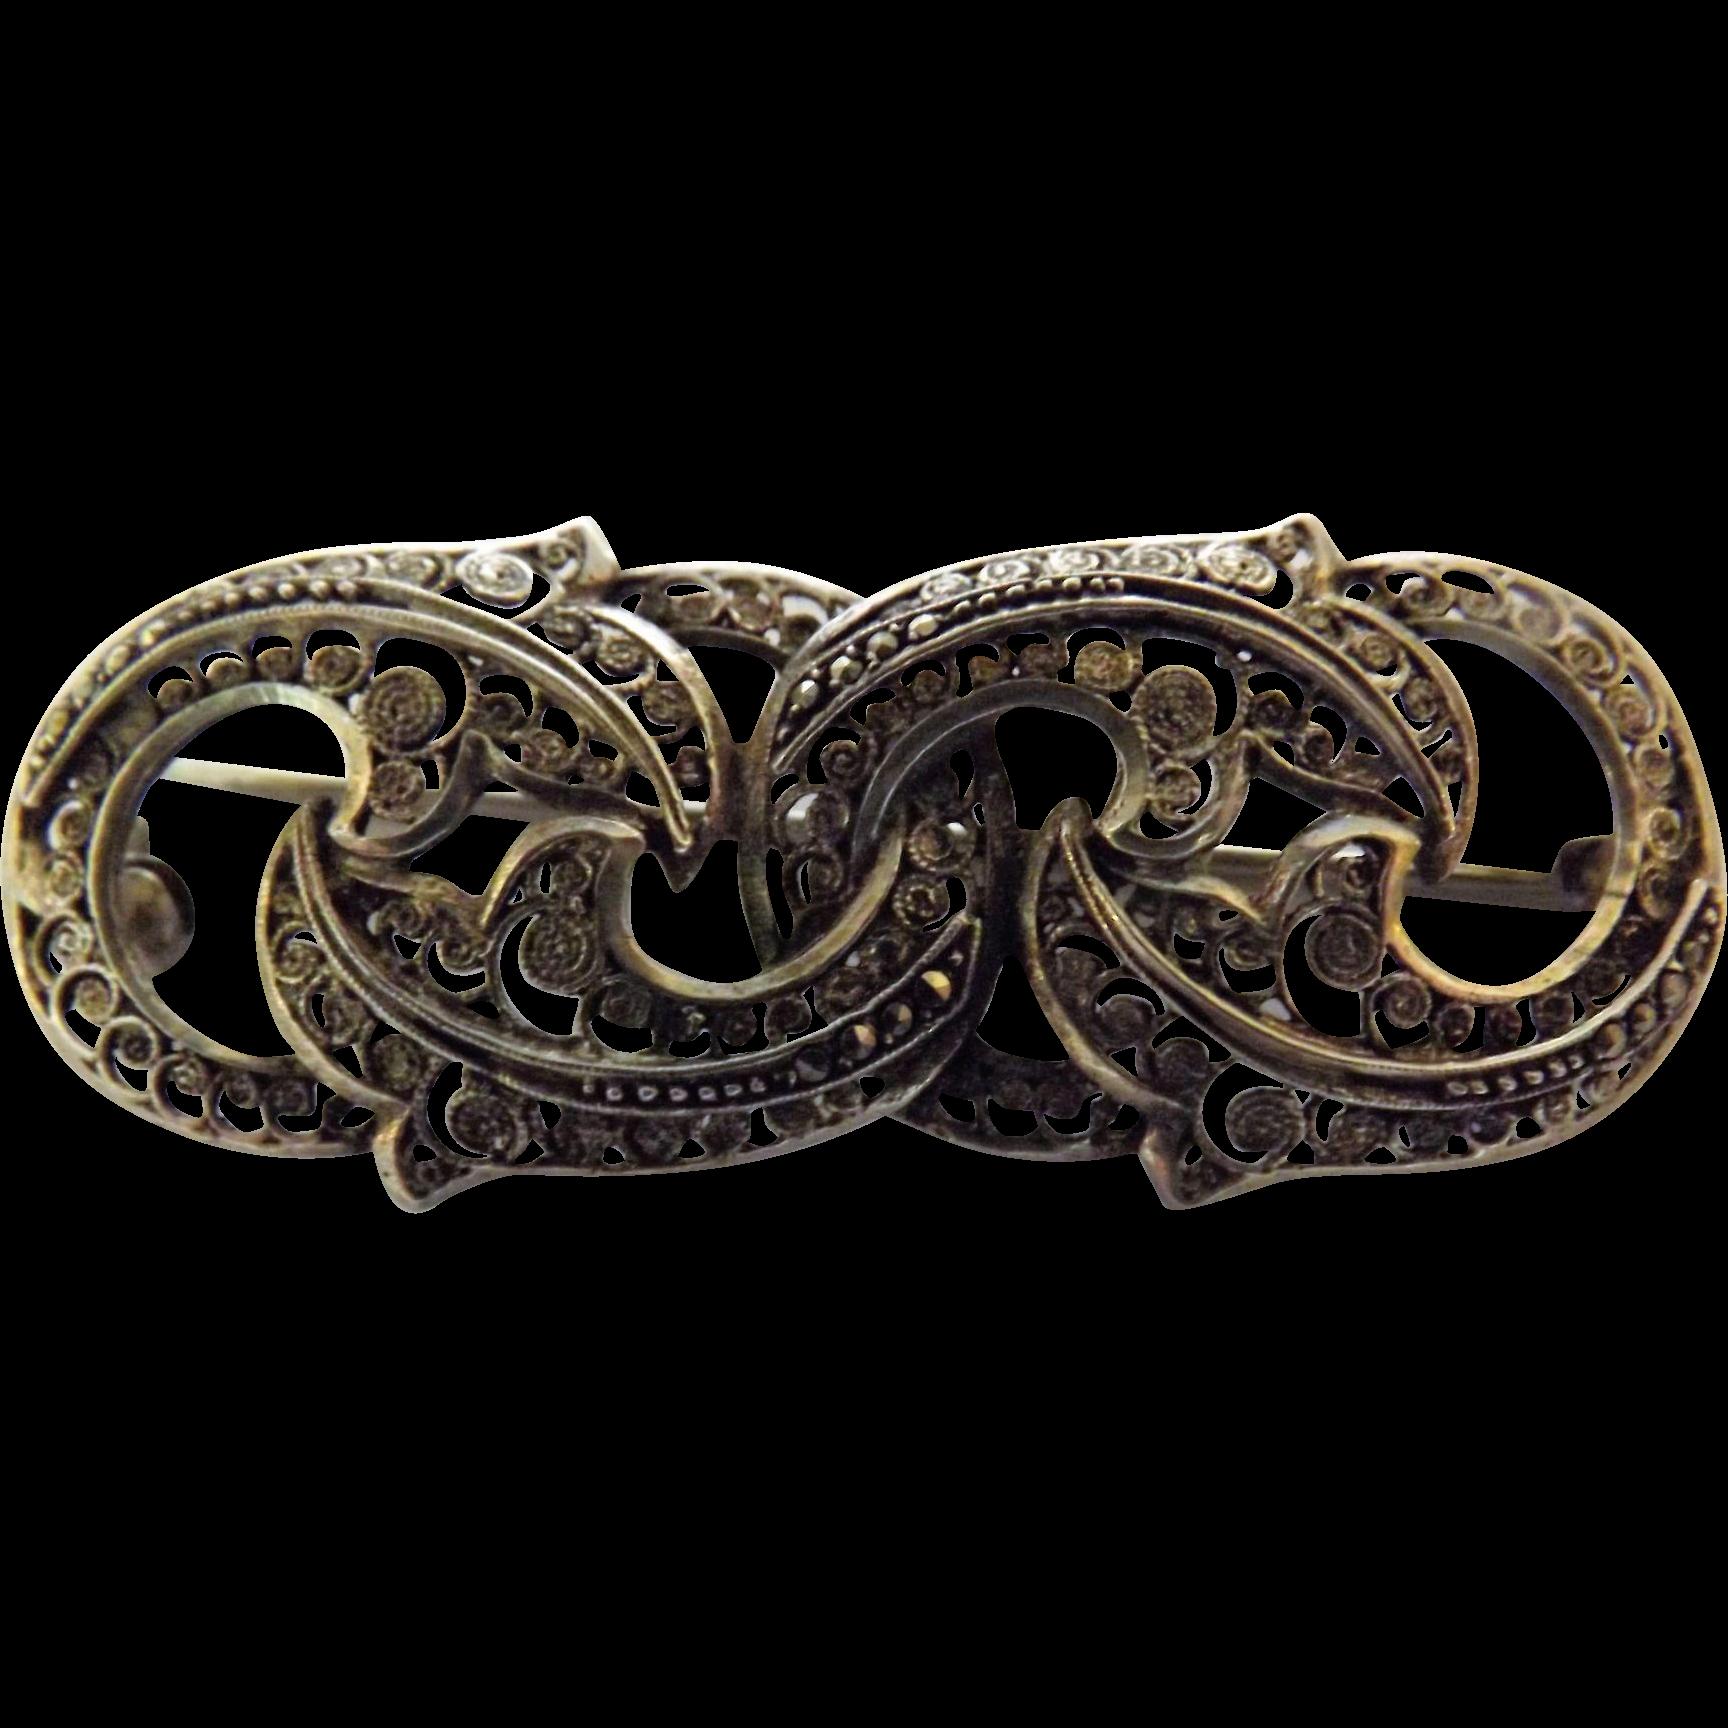 German Filigree Sterling Silver Brooch - Circa 1890-1910